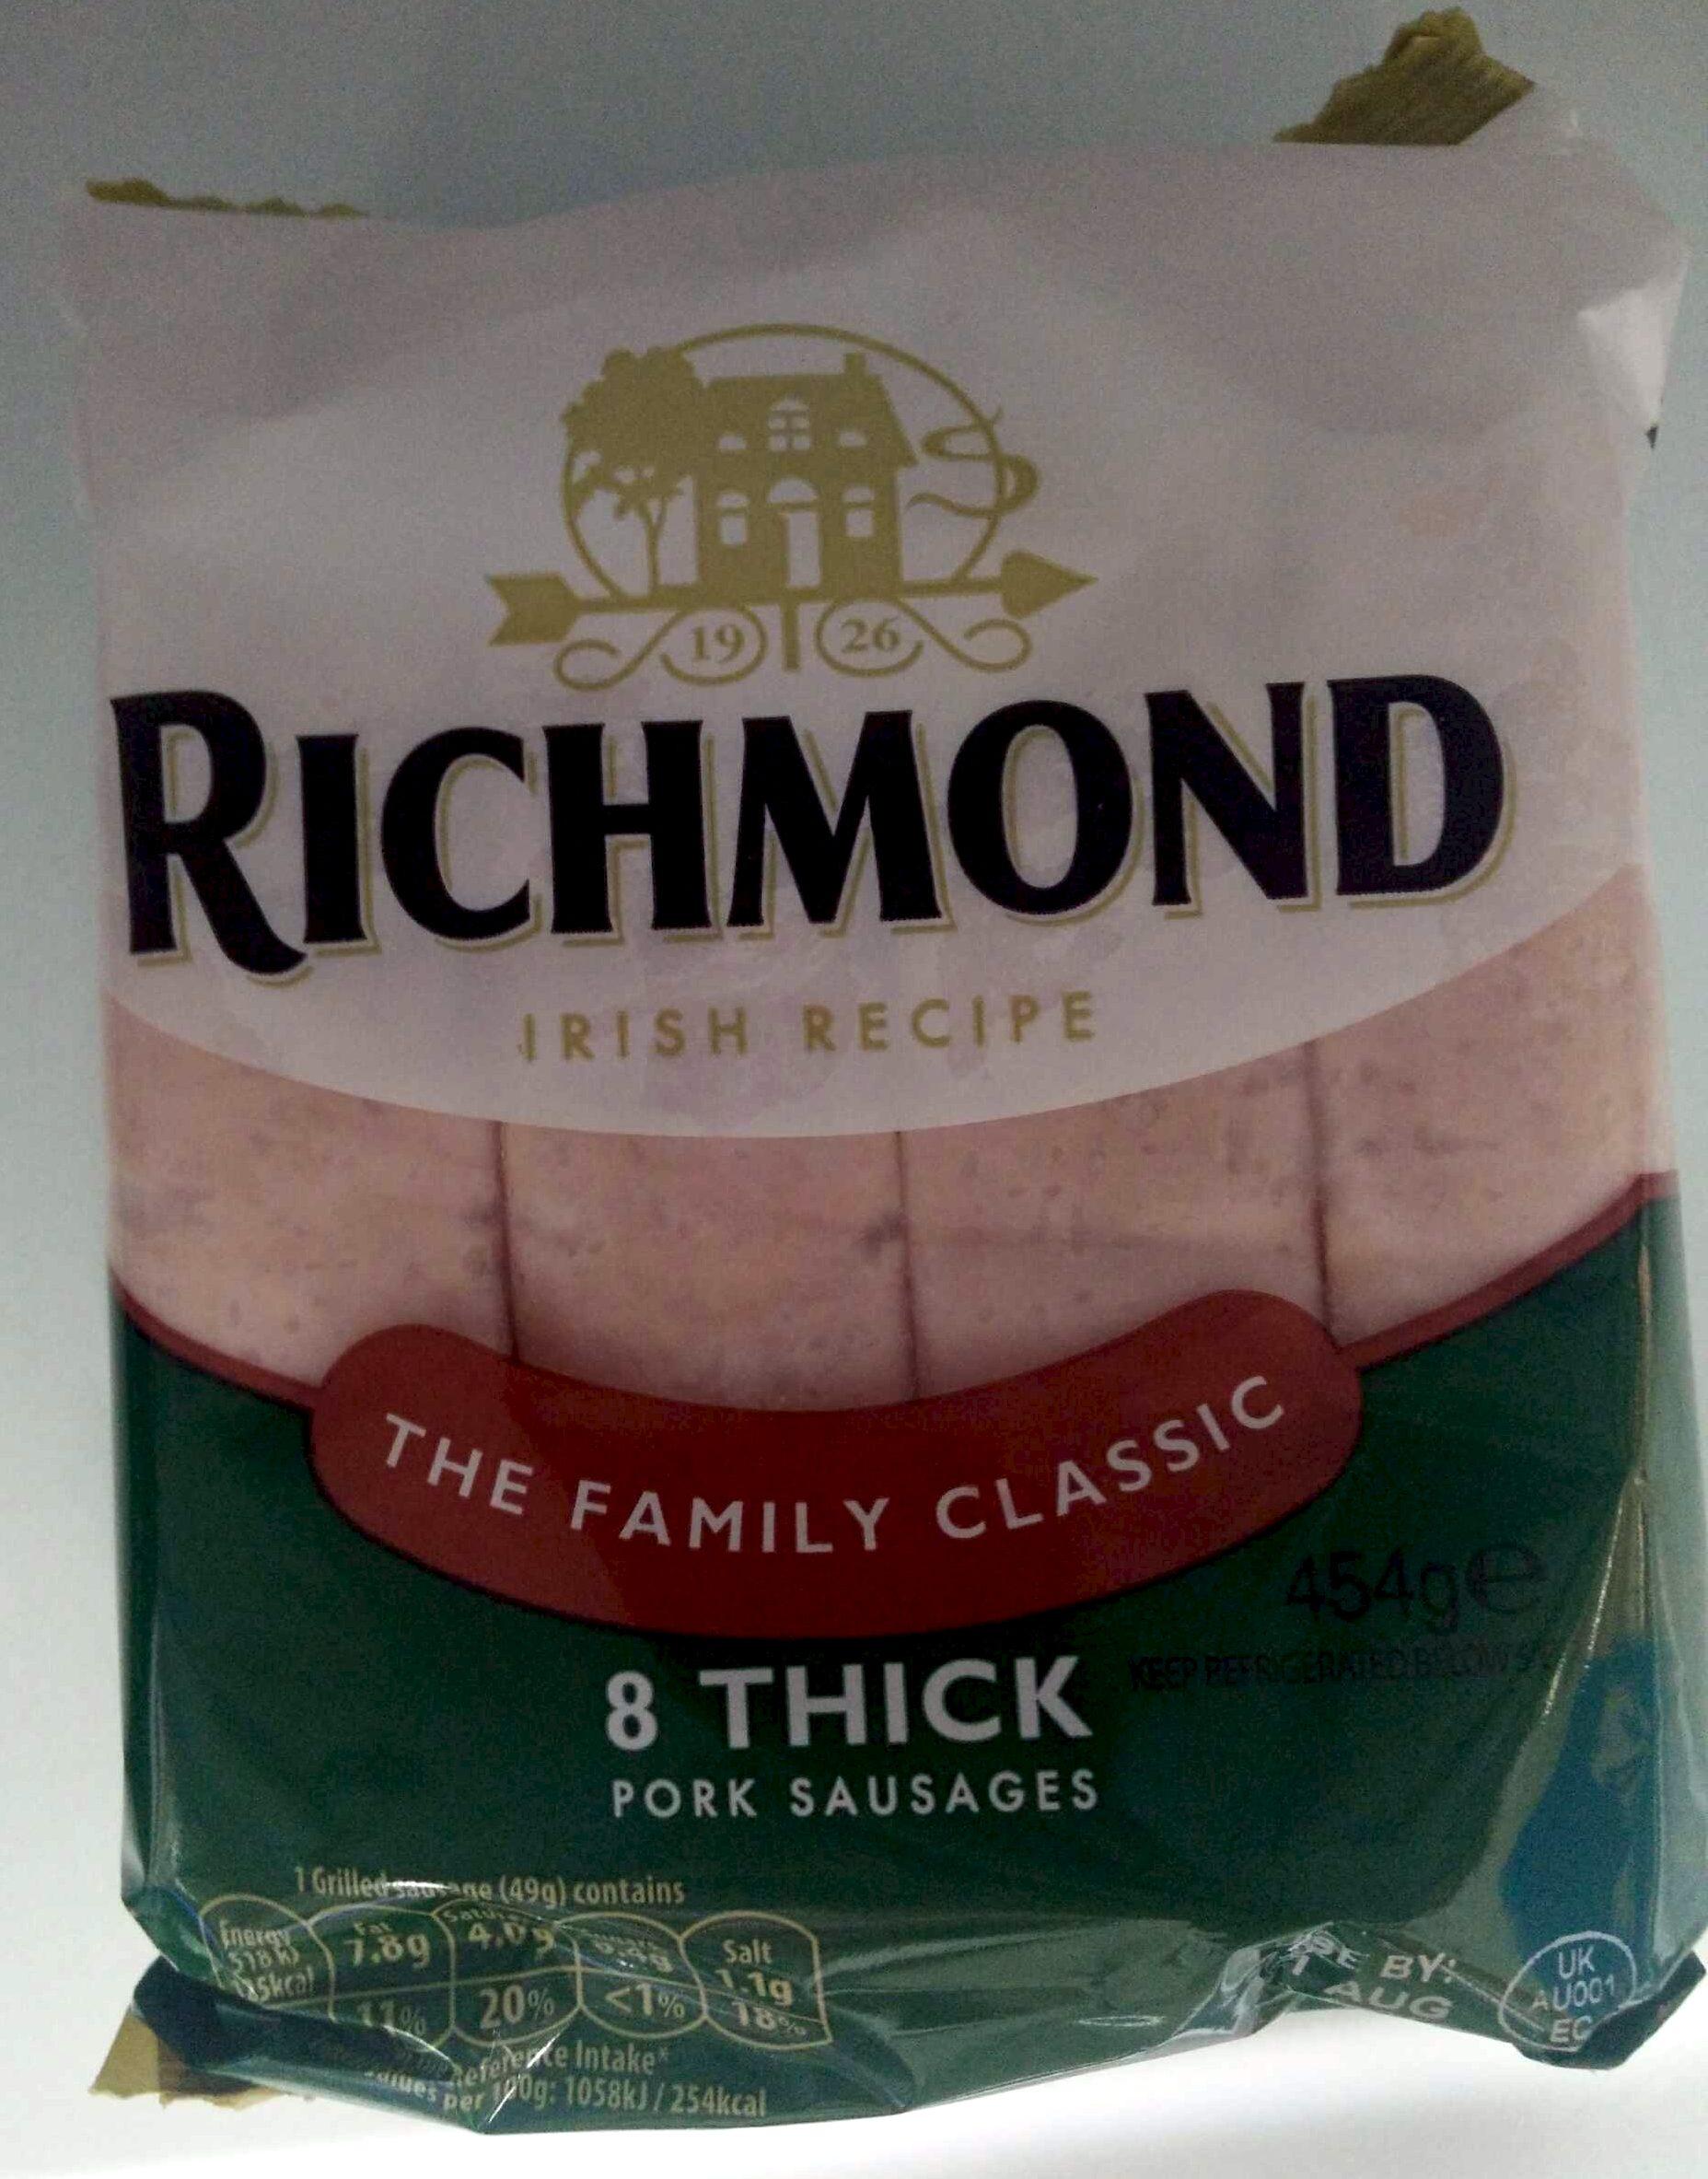 8 thick Pork Sausages - Product - en